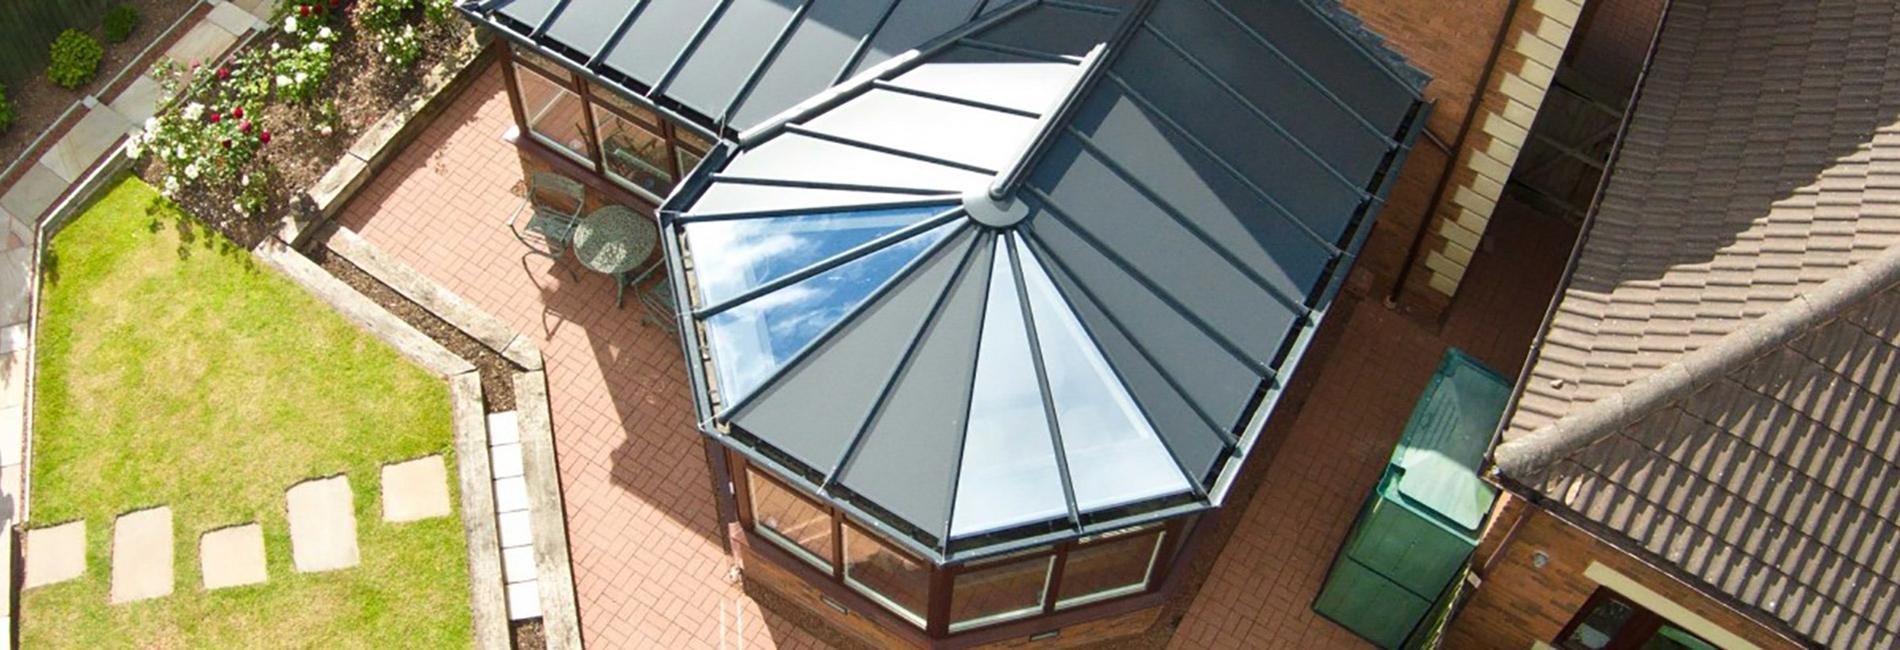 Livin Roof